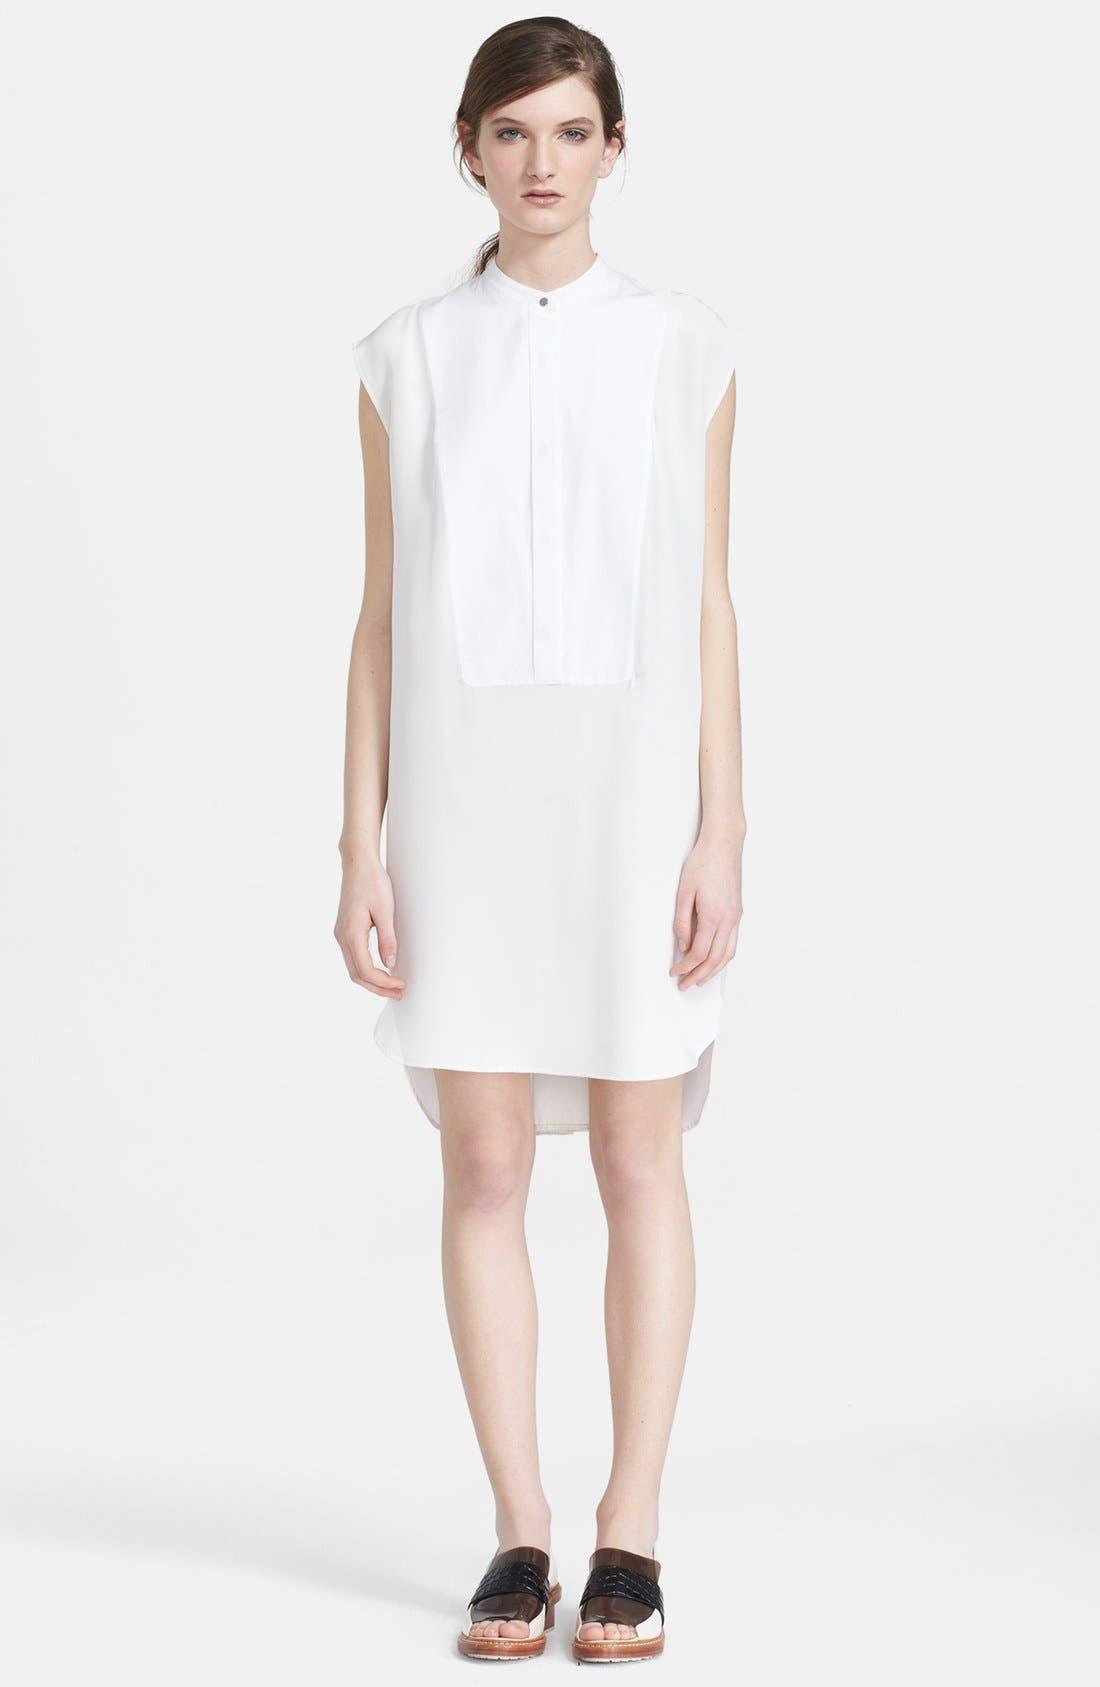 Main Image - 3.1 Phillip Lim Collarless Cotton Shirtdress